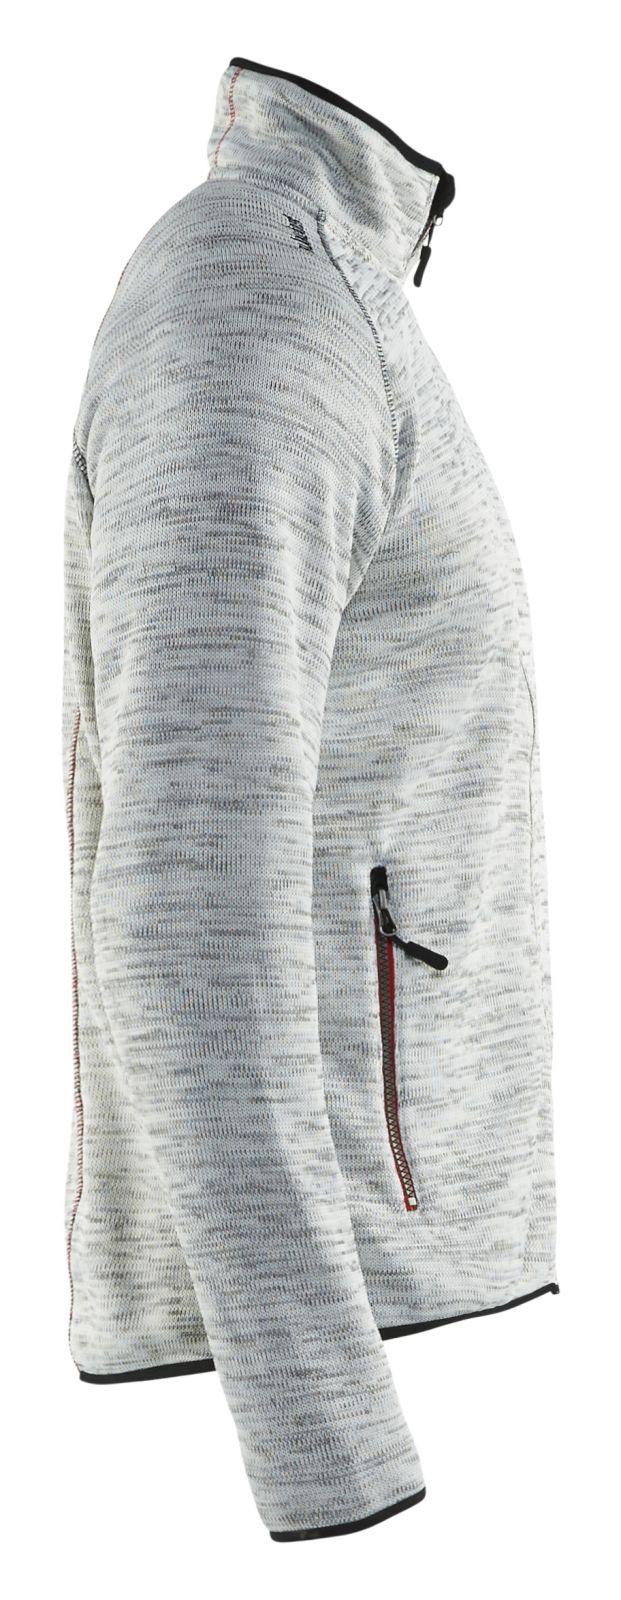 Blaklader Gebreide vesten 49422117 grijs melange-rood(9056)